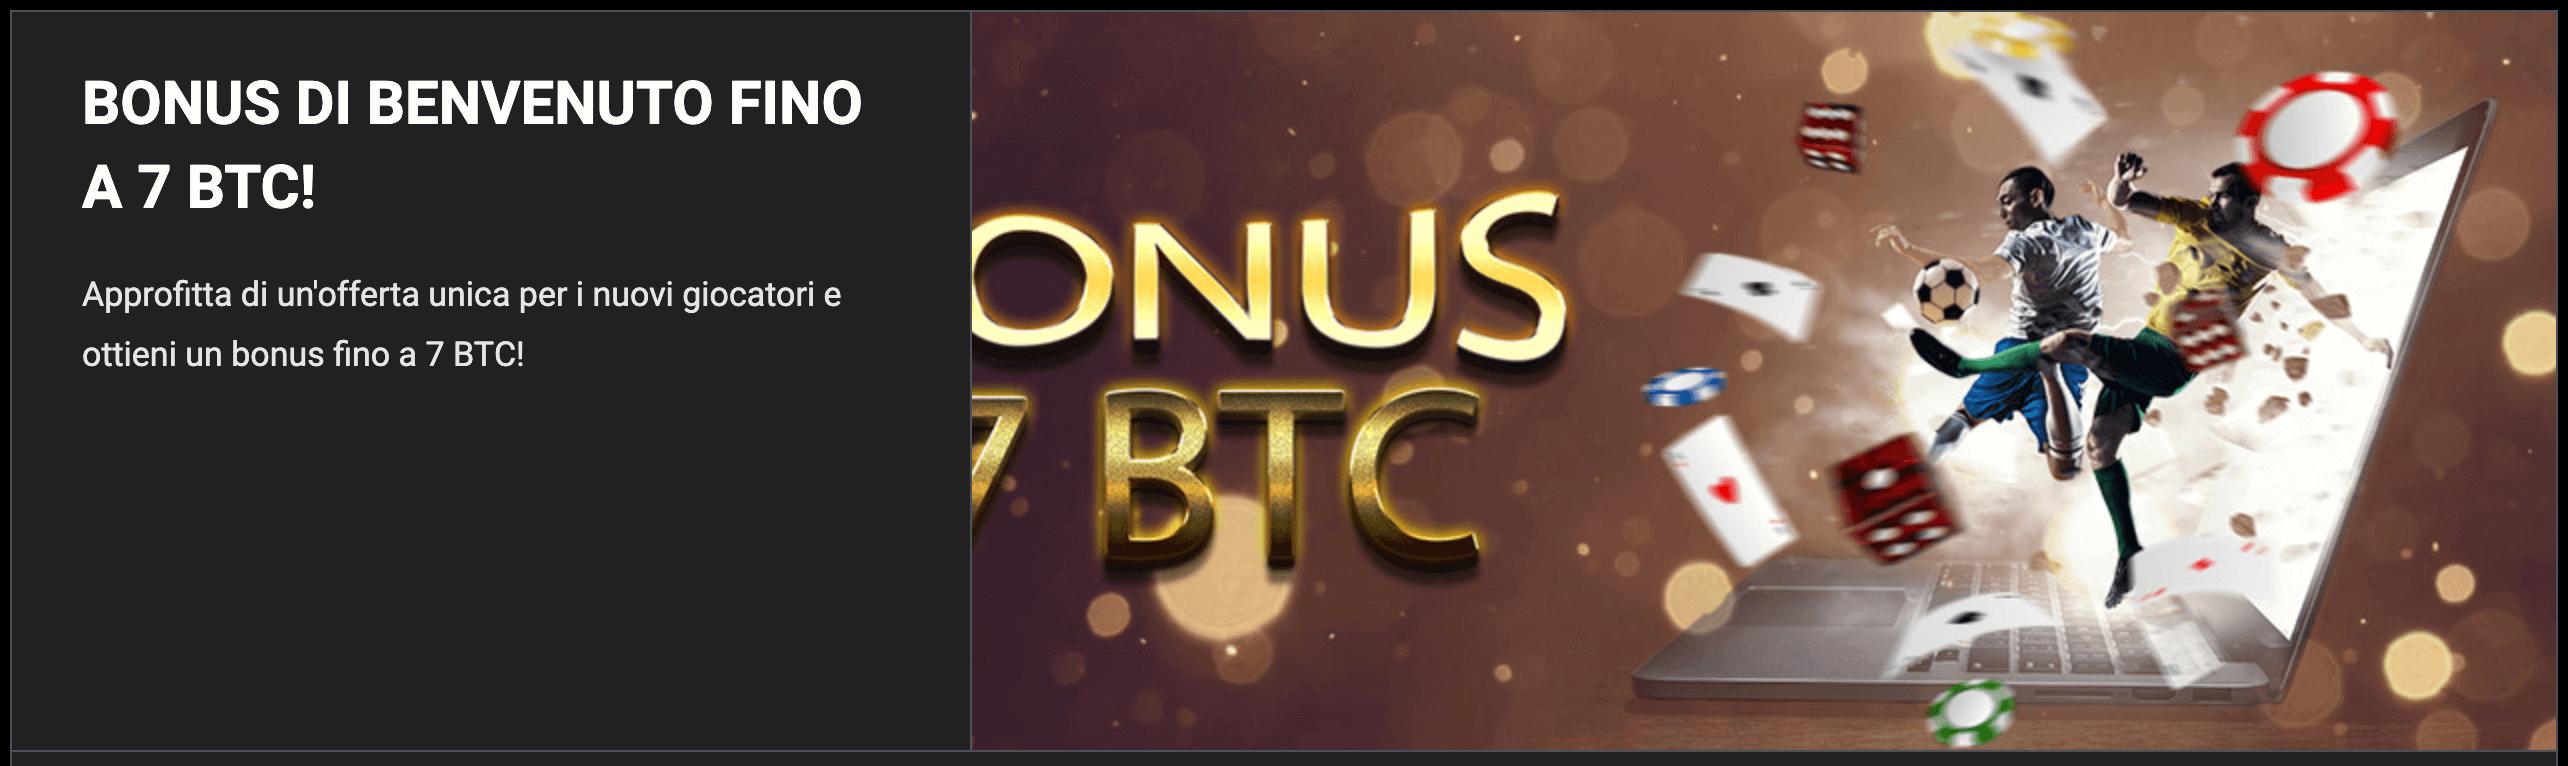 bitcoin scommesse sportive bonus senza deposito